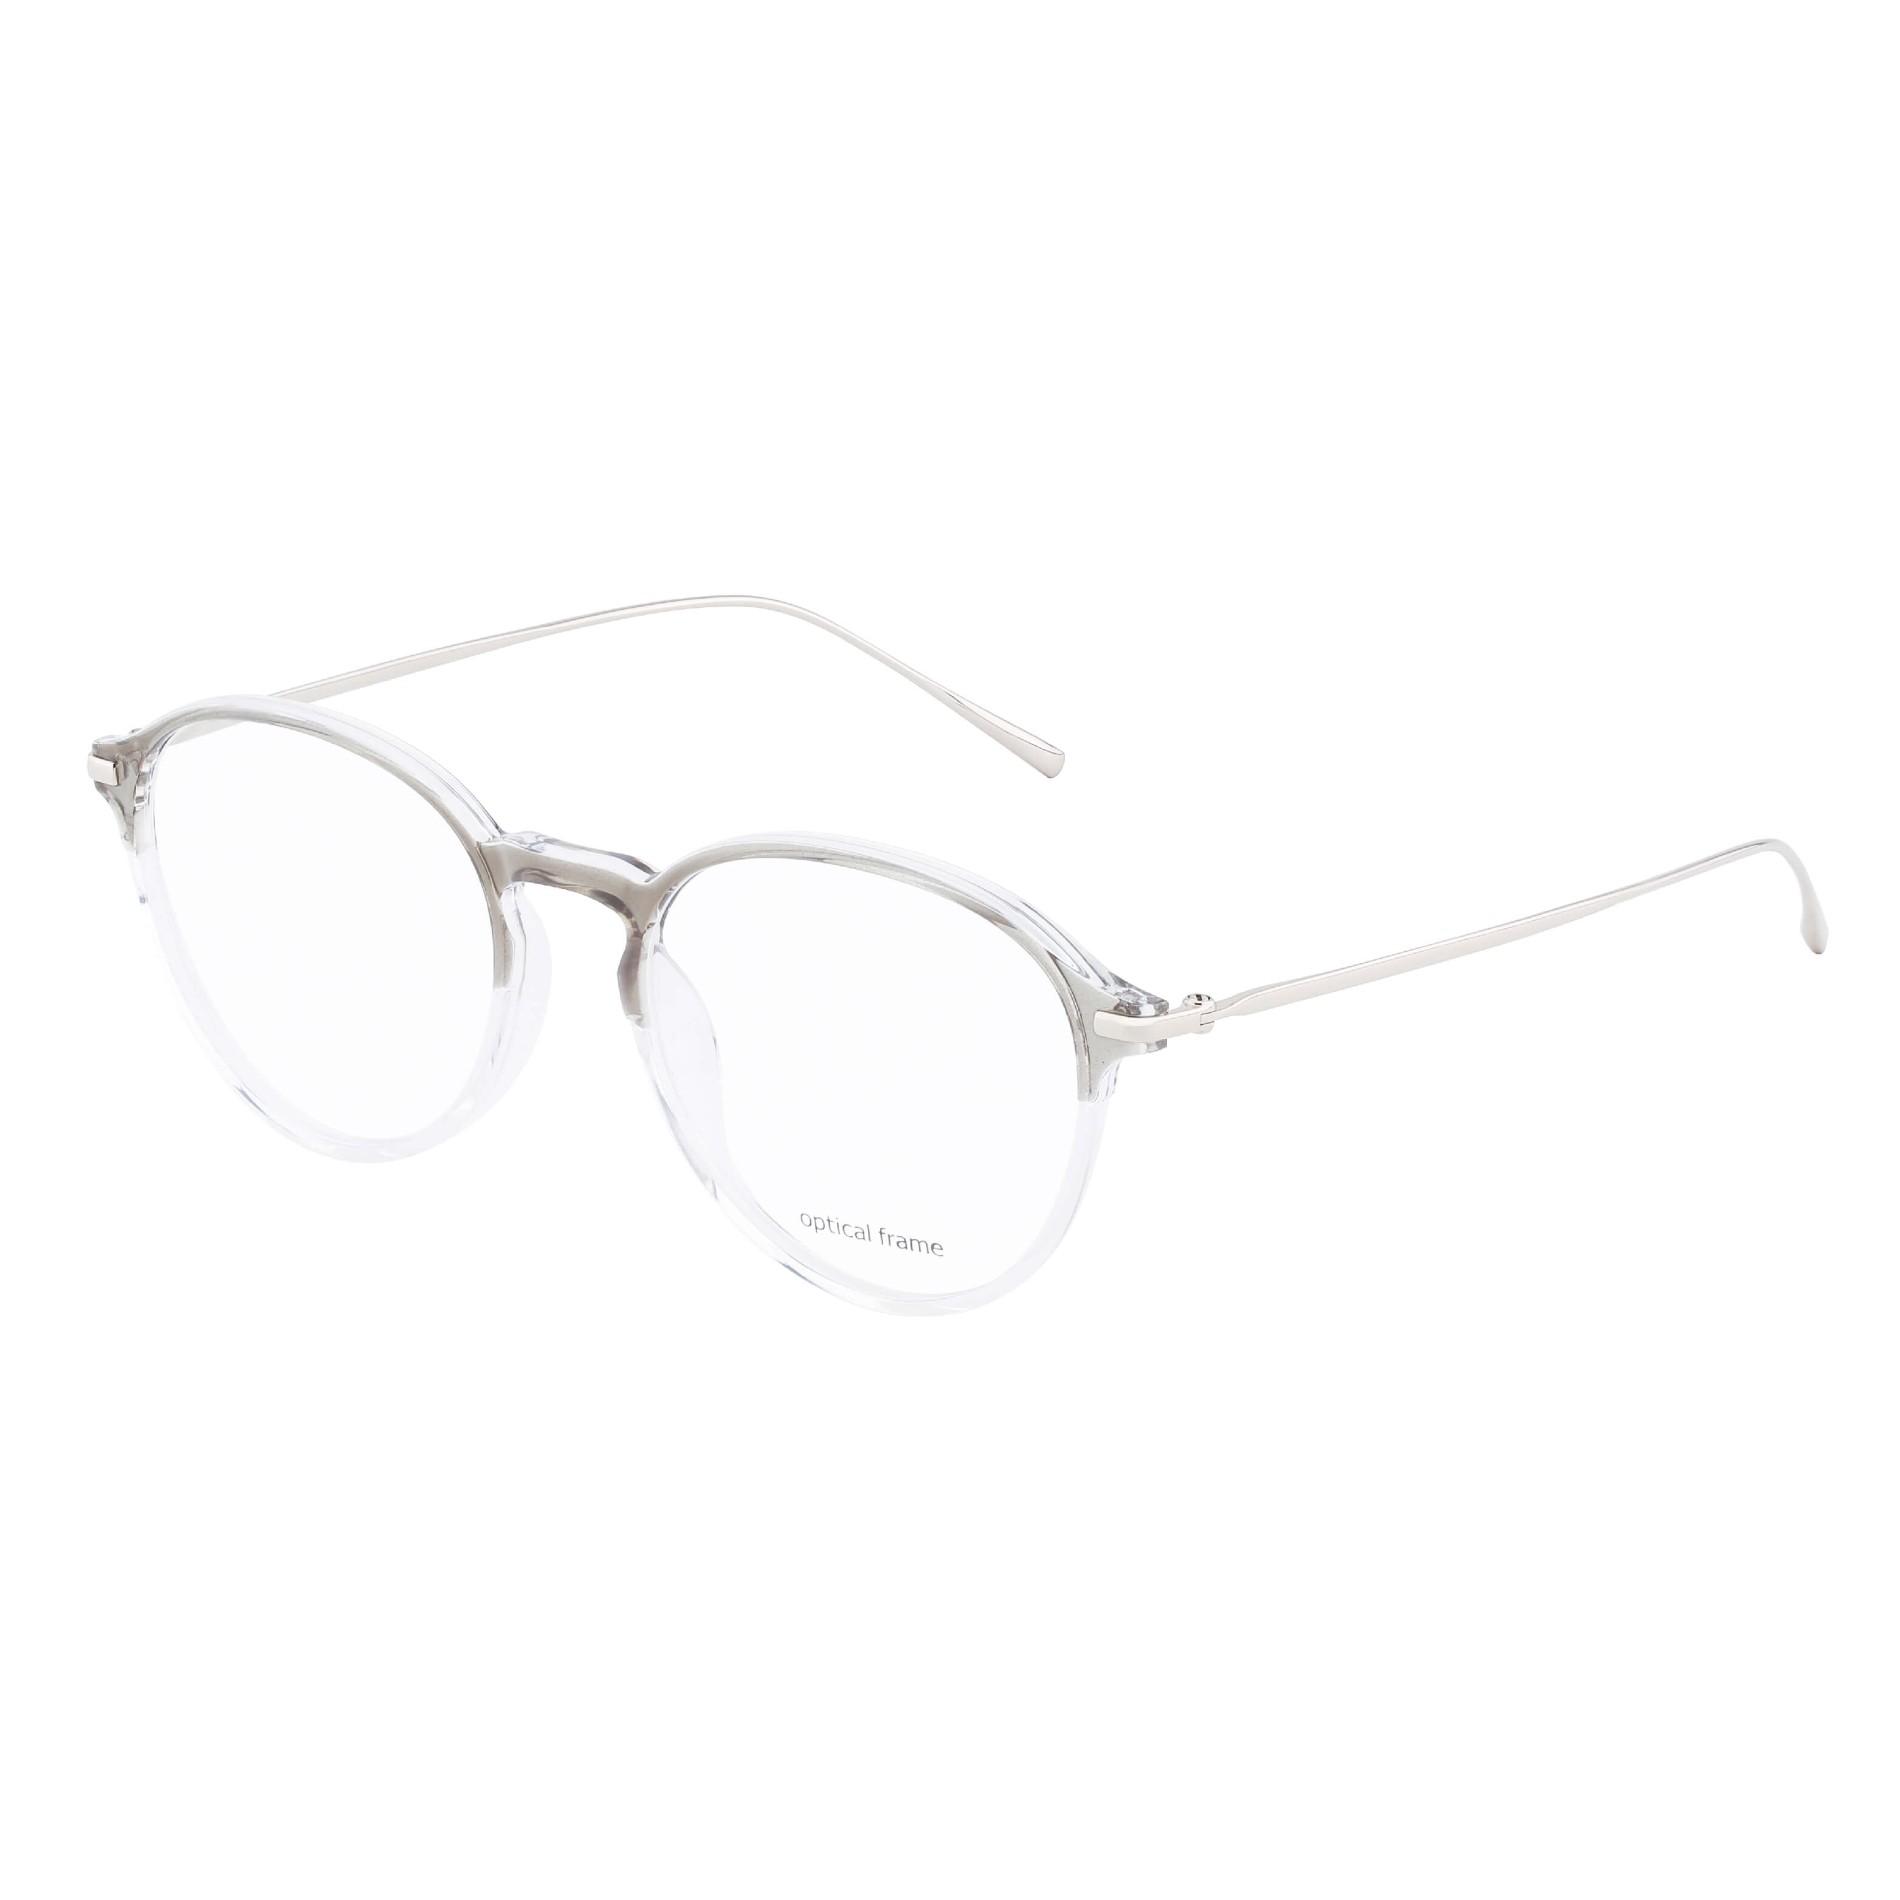 Ladies Business Style TR90 Ultralight Eyeglasses Frame Manufacturers, Ladies Business Style TR90 Ultralight Eyeglasses Frame Factory, Supply Ladies Business Style TR90 Ultralight Eyeglasses Frame